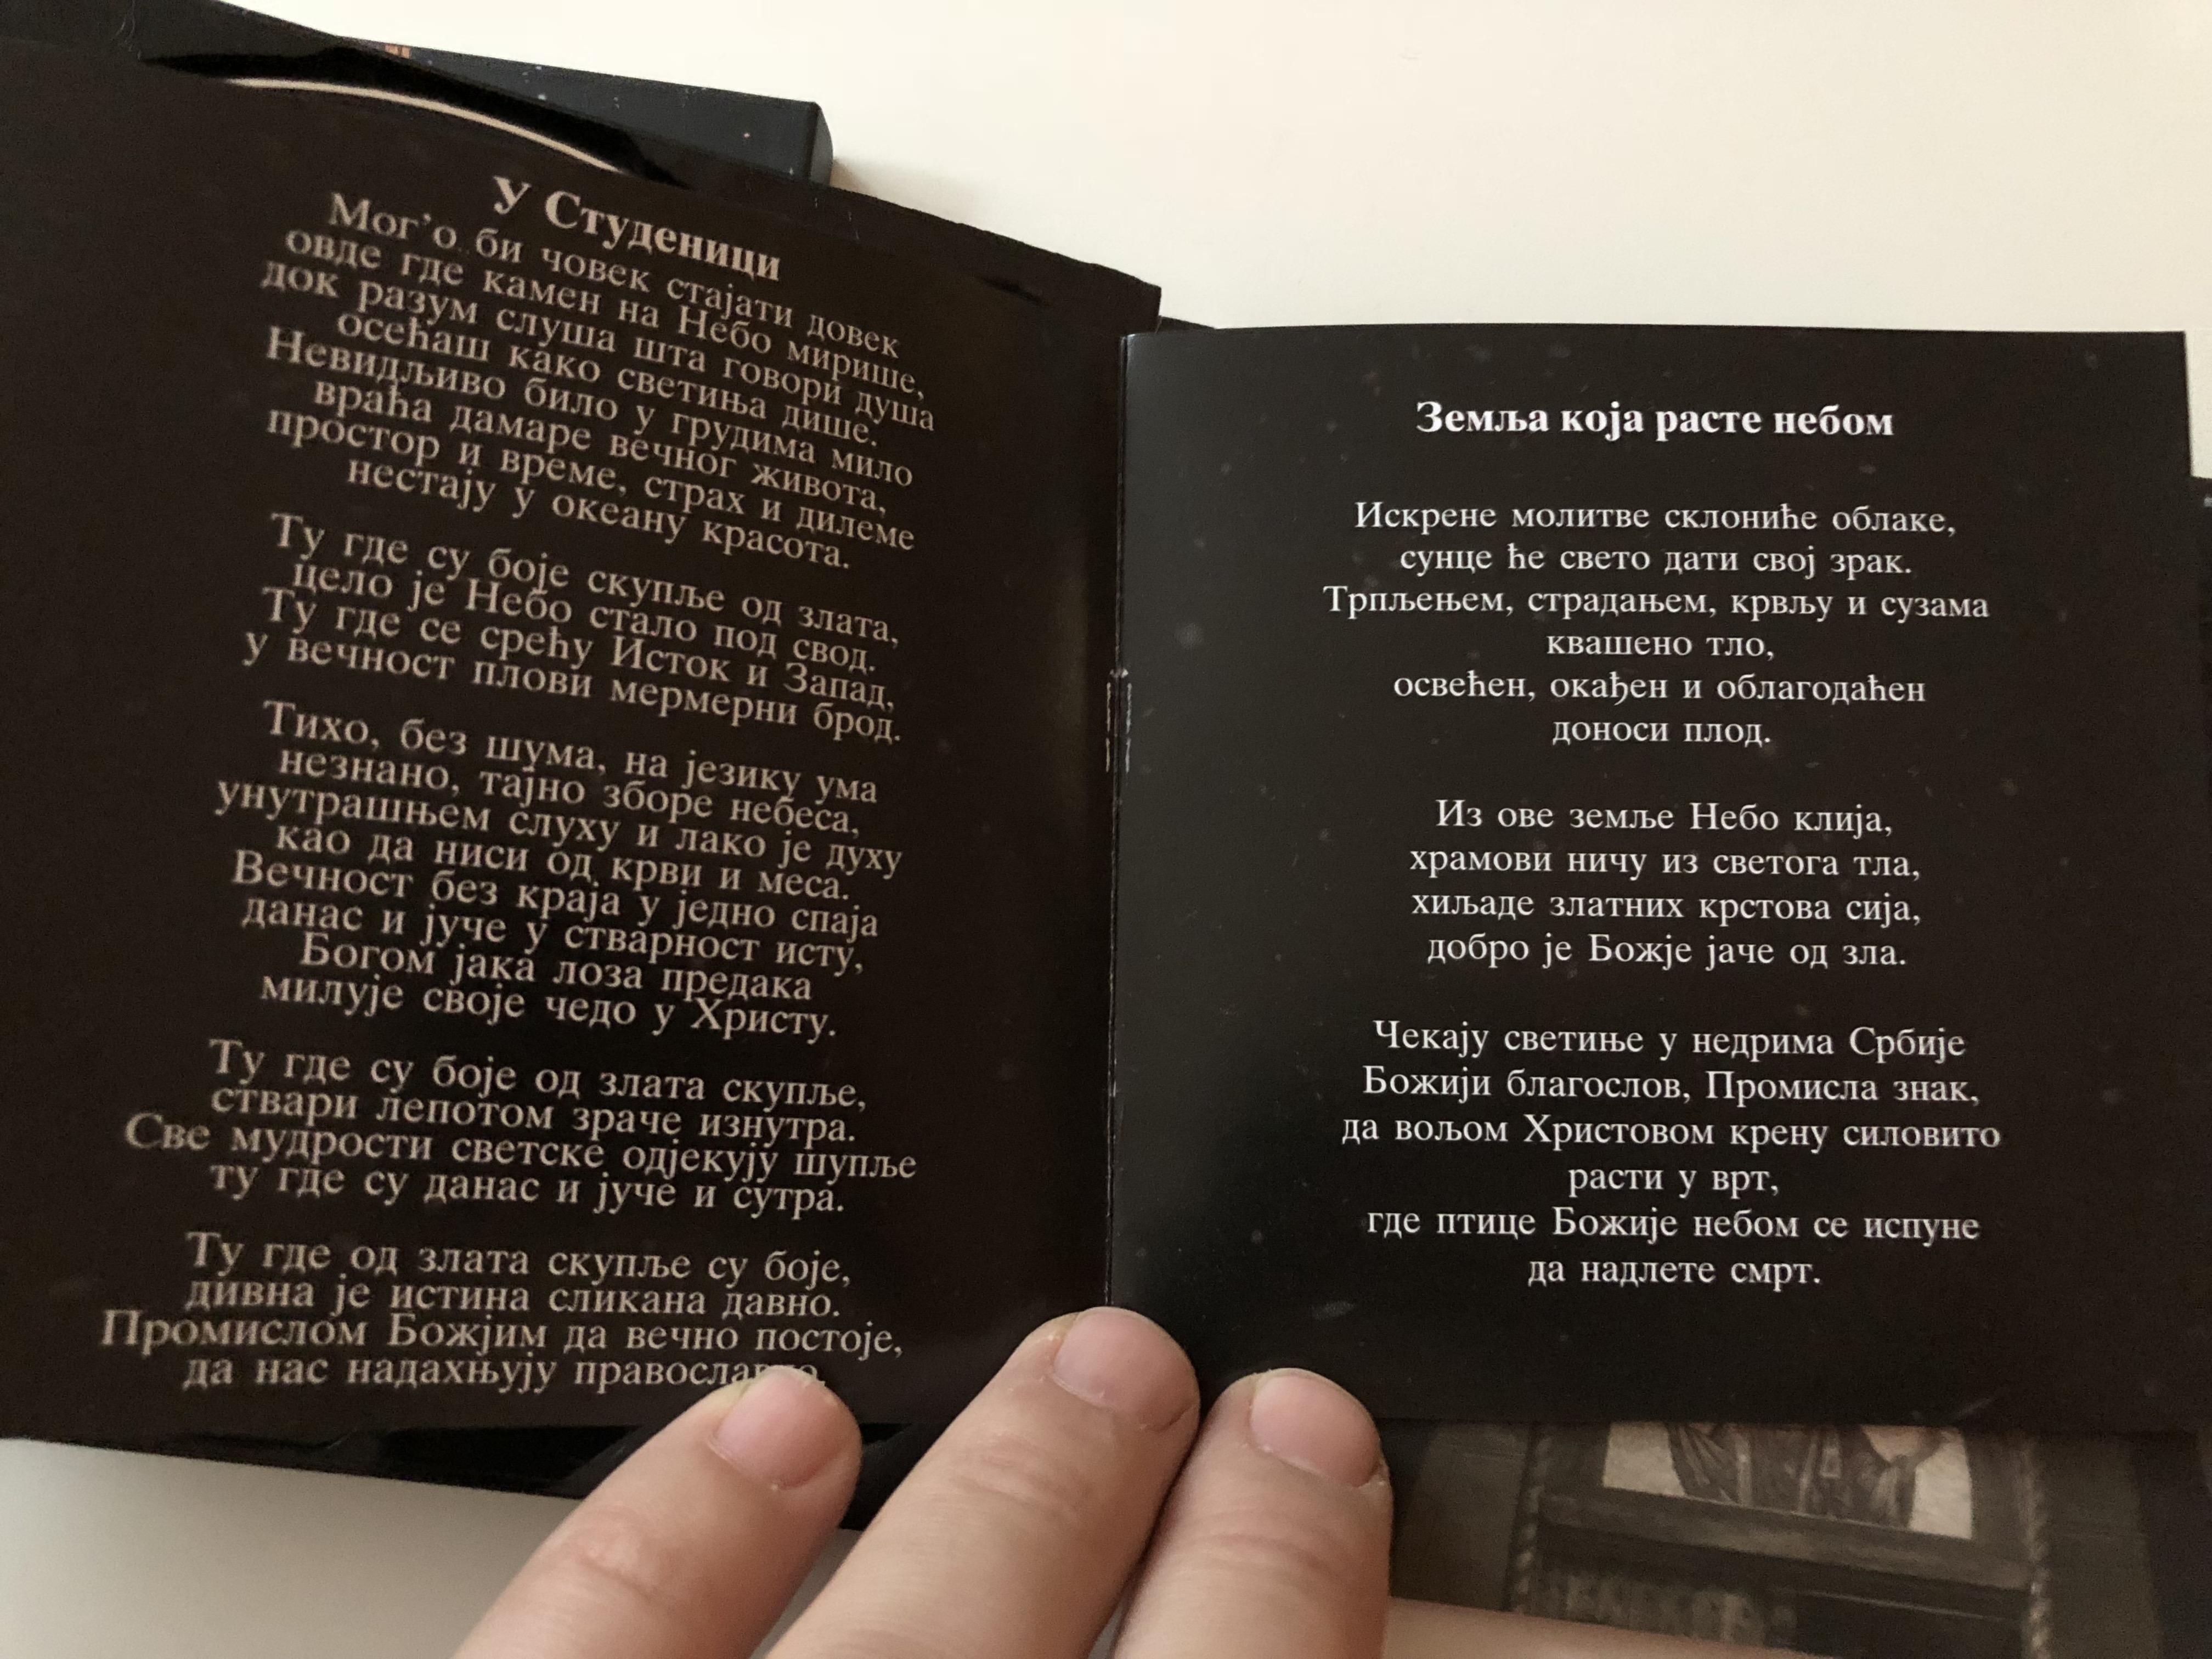 serbian-bright-serbian-stars-orthodox-music-cd-6-.jpg